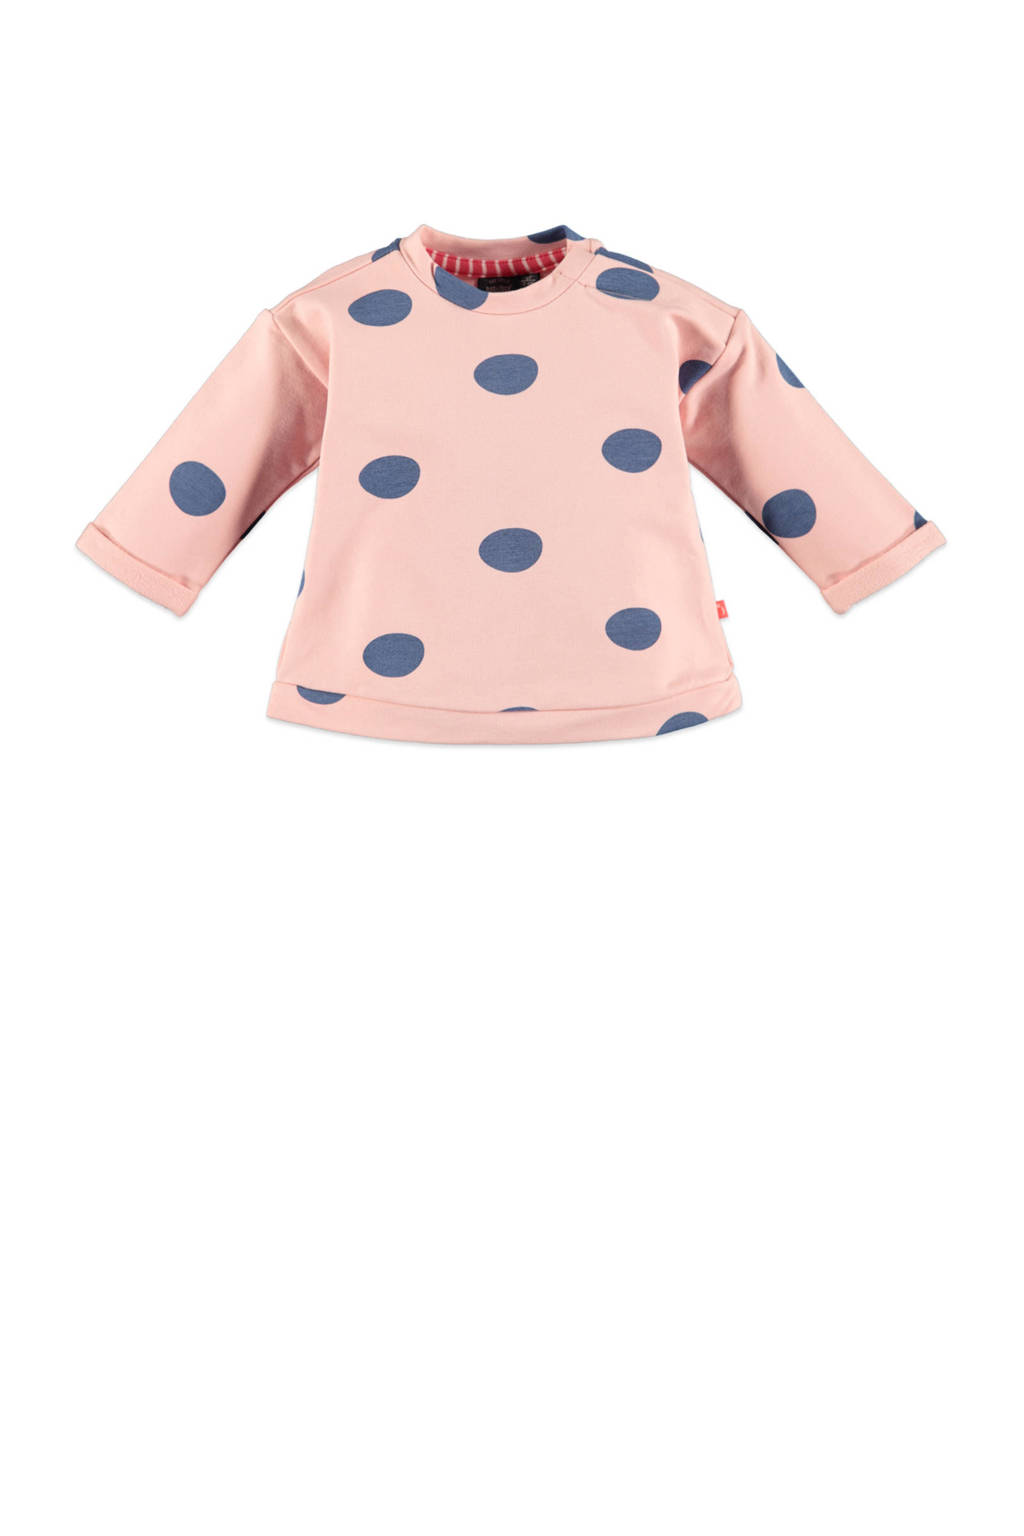 Babyface sweater met stippen lichtroze/blauw, Lichtroze/blauw